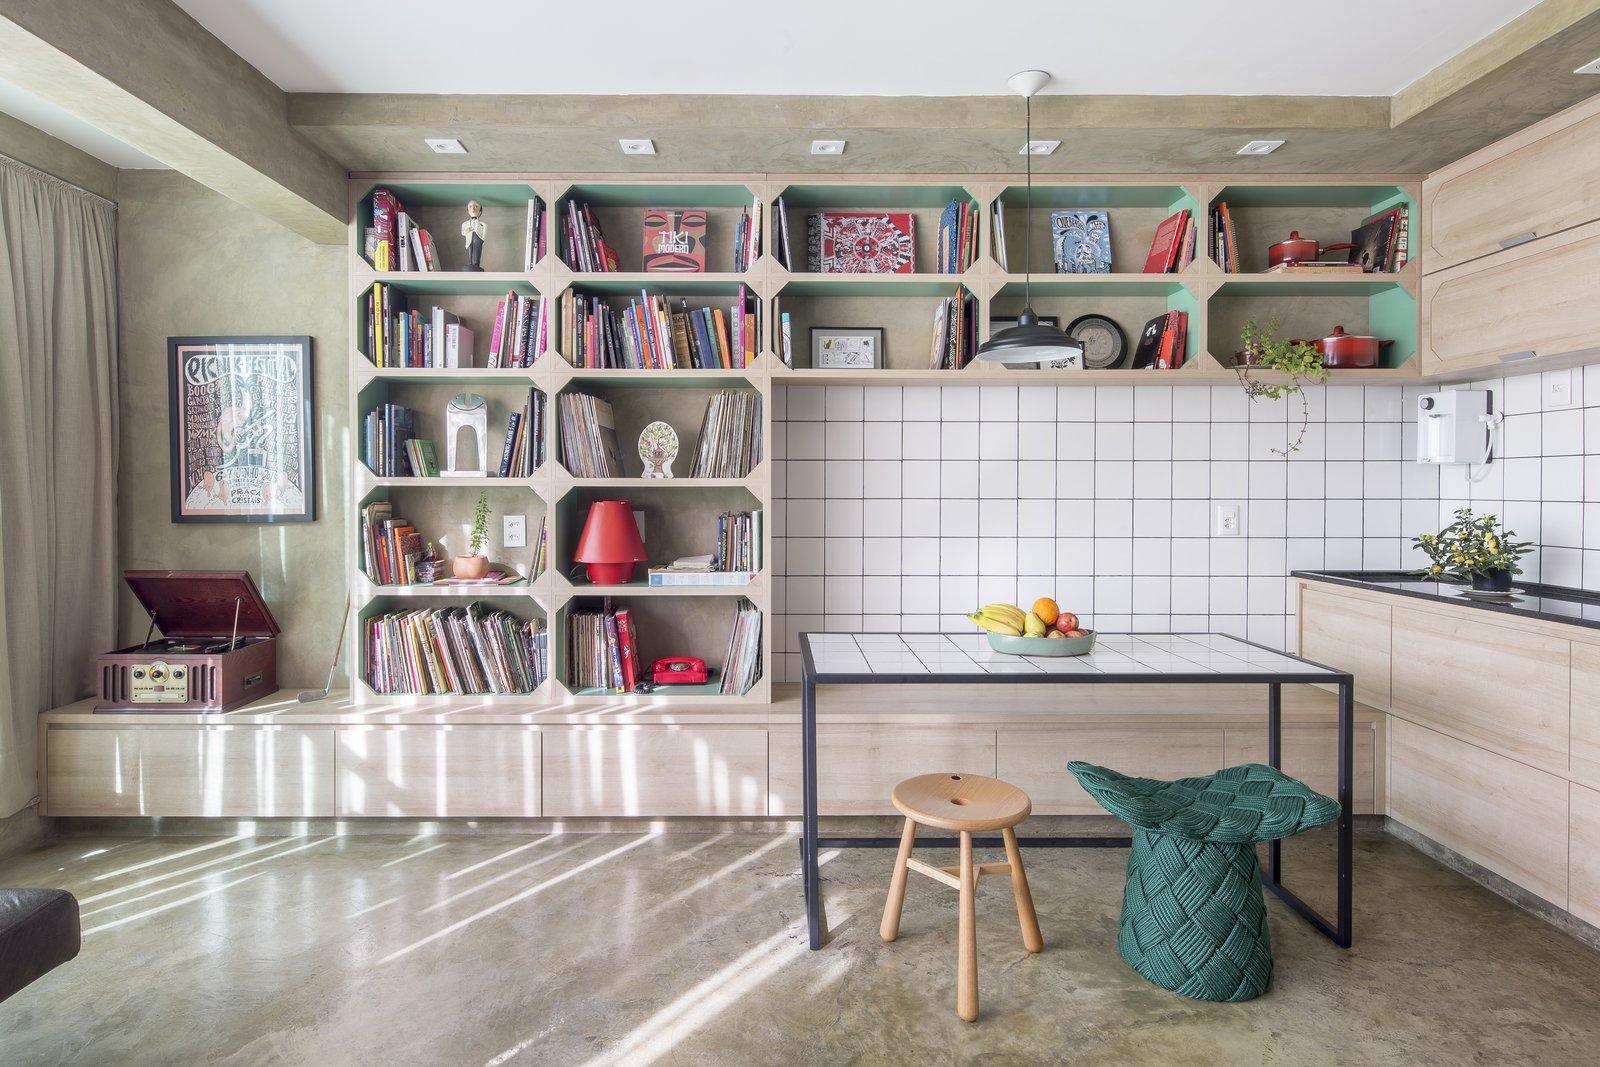 Gomez Apartment kitchen